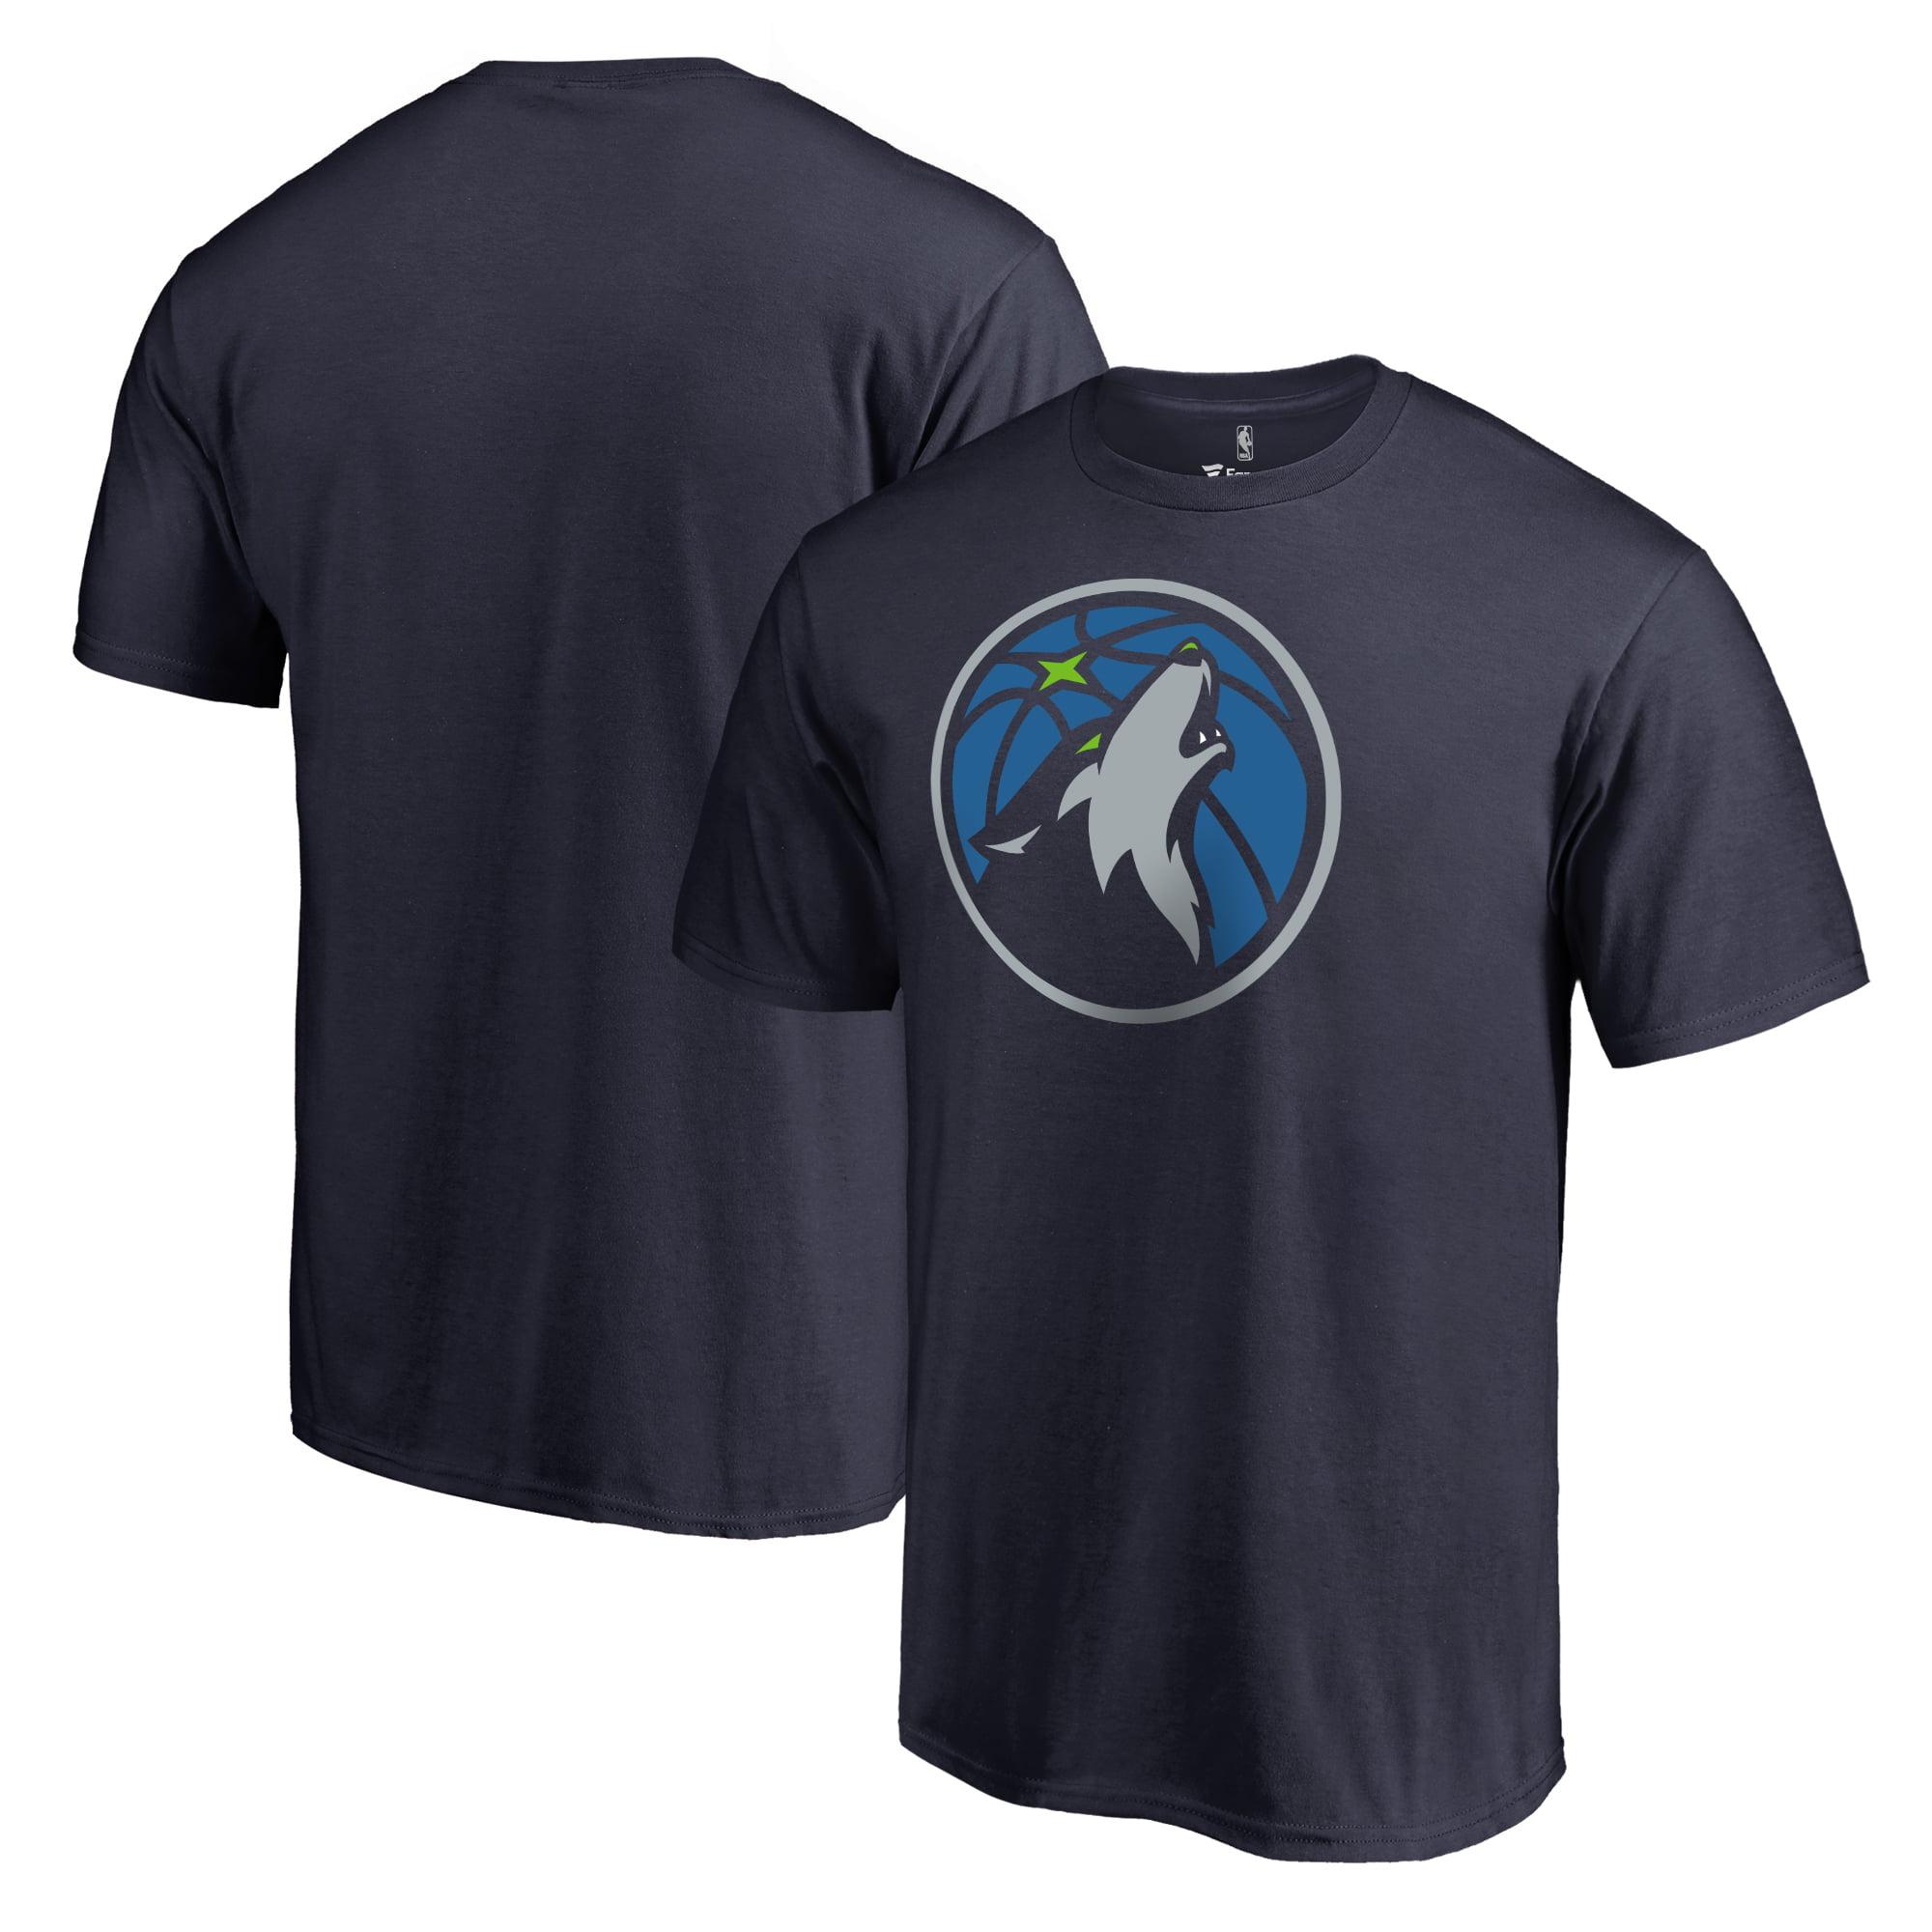 Minnesota Timberwolves Fanatics Branded Primary Logo Big & Tall T-Shirt - Navy